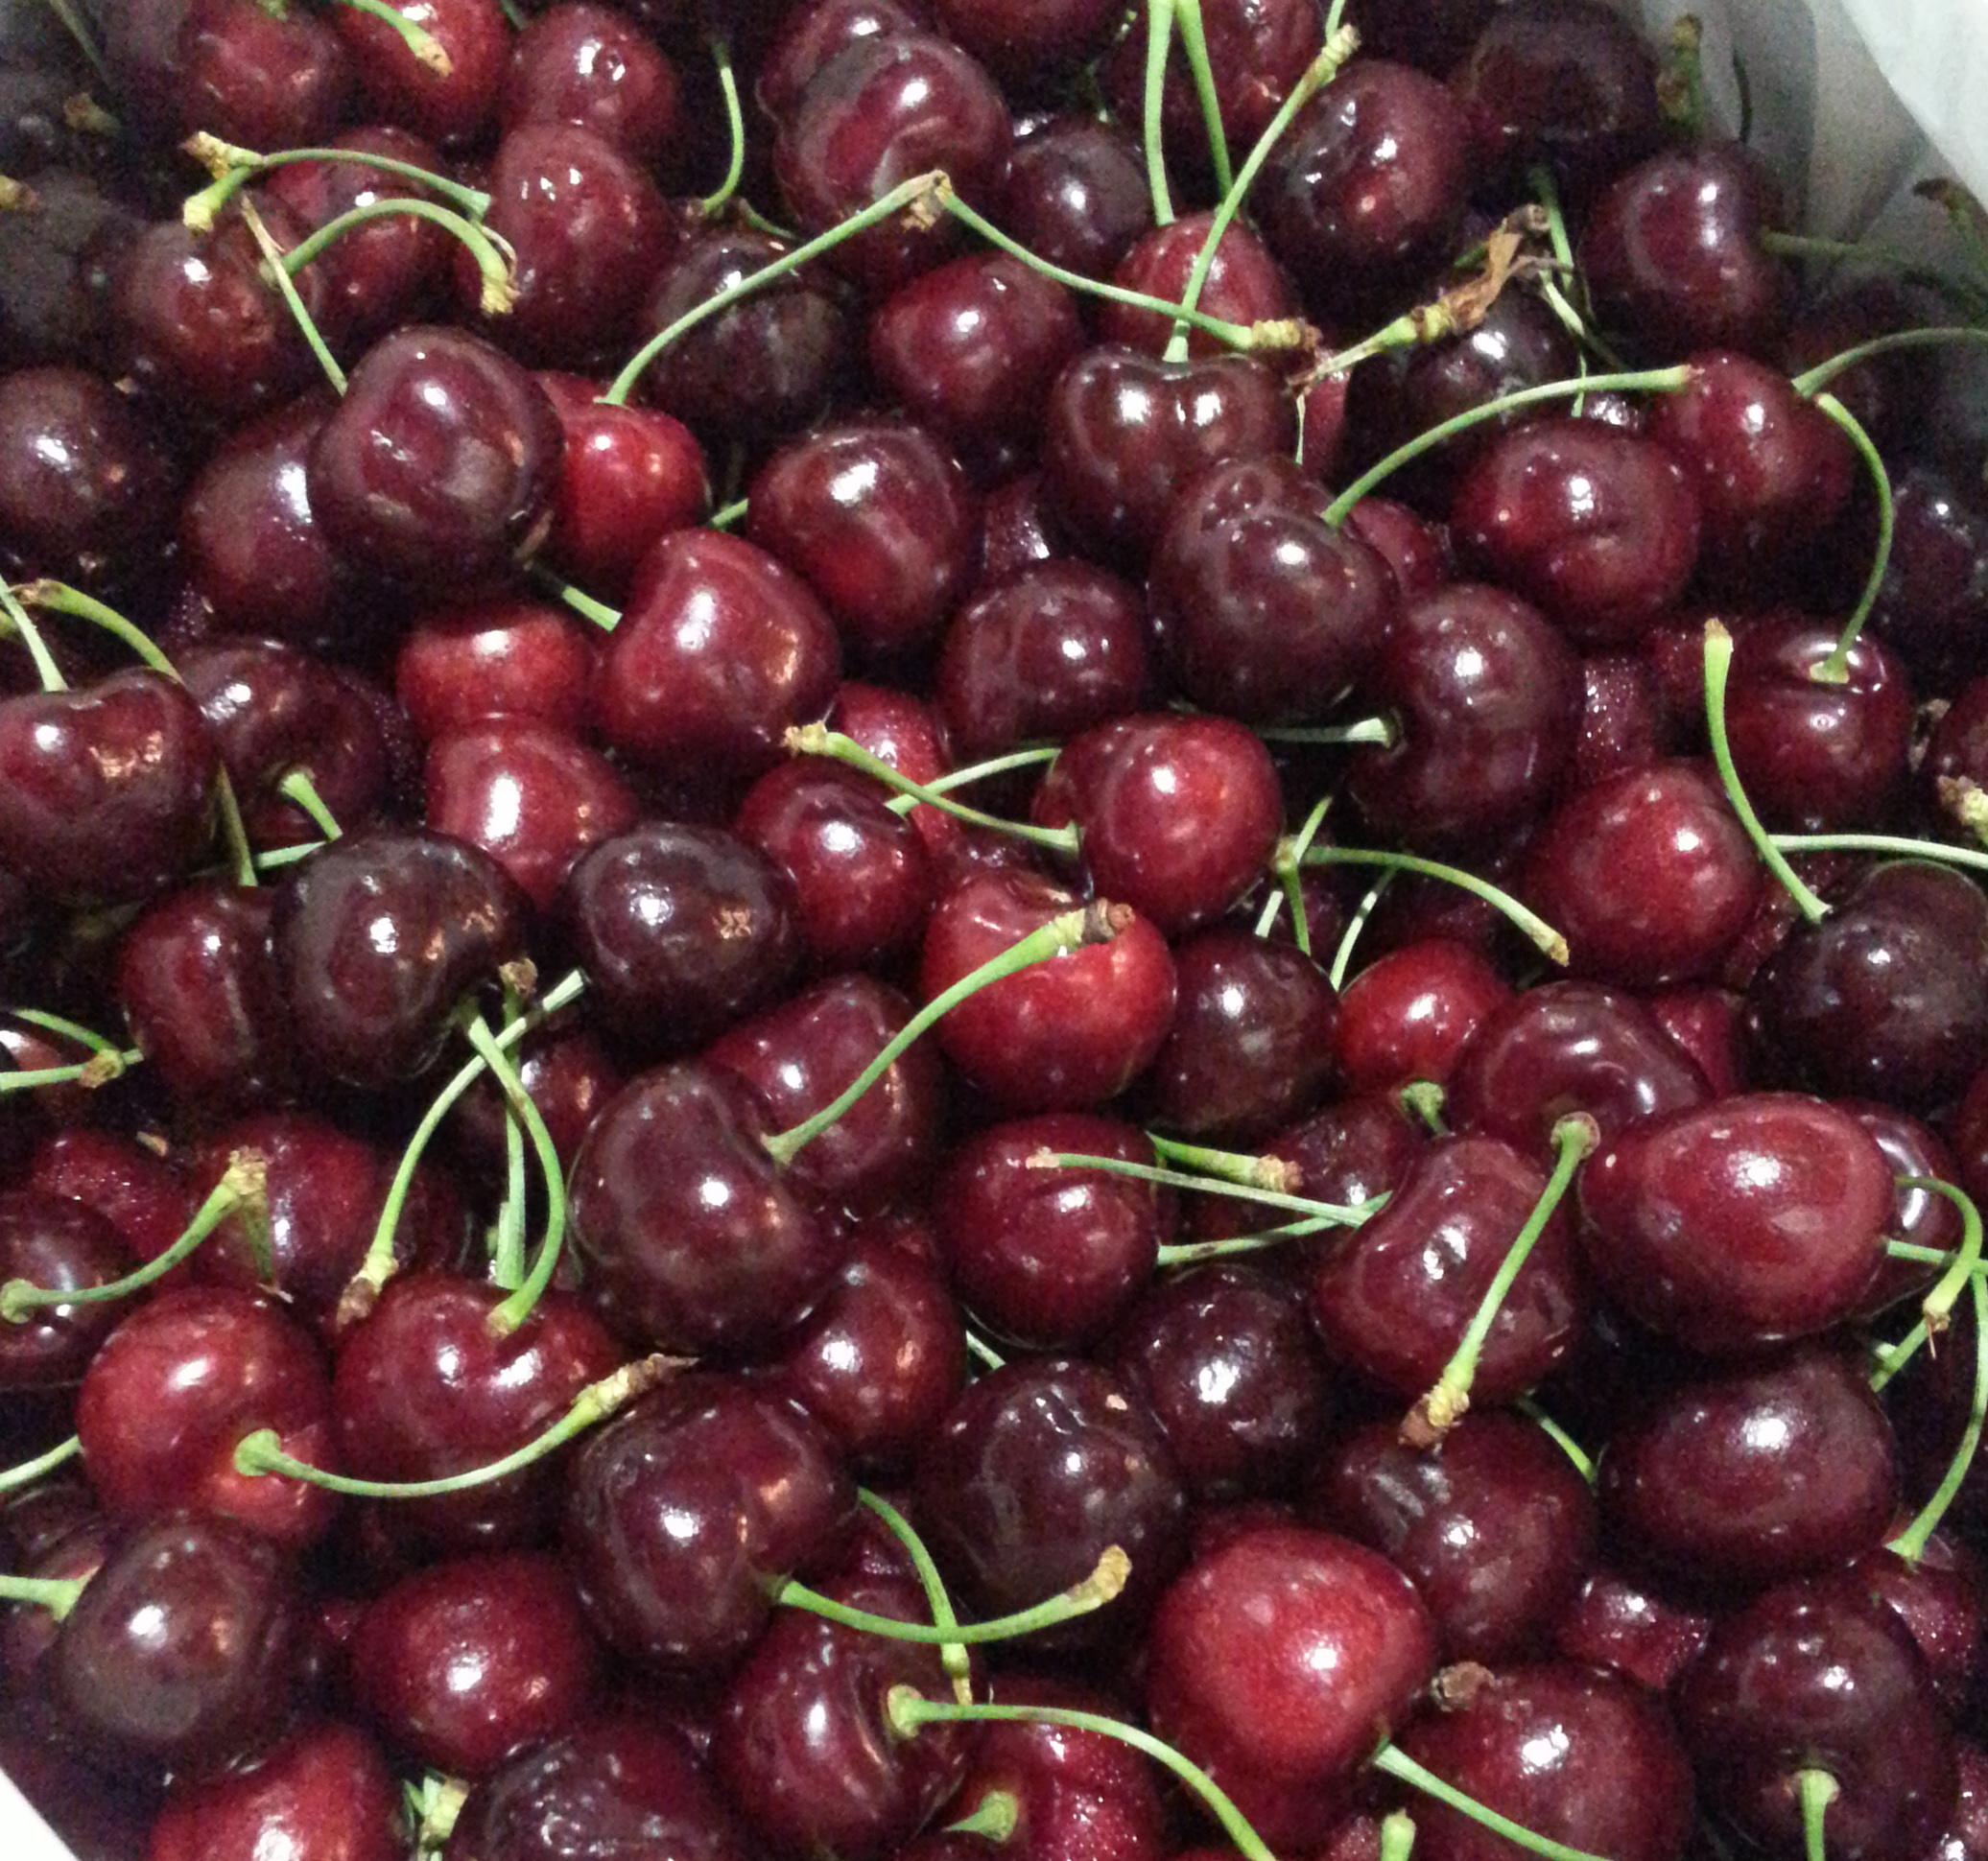 USA- Cherry